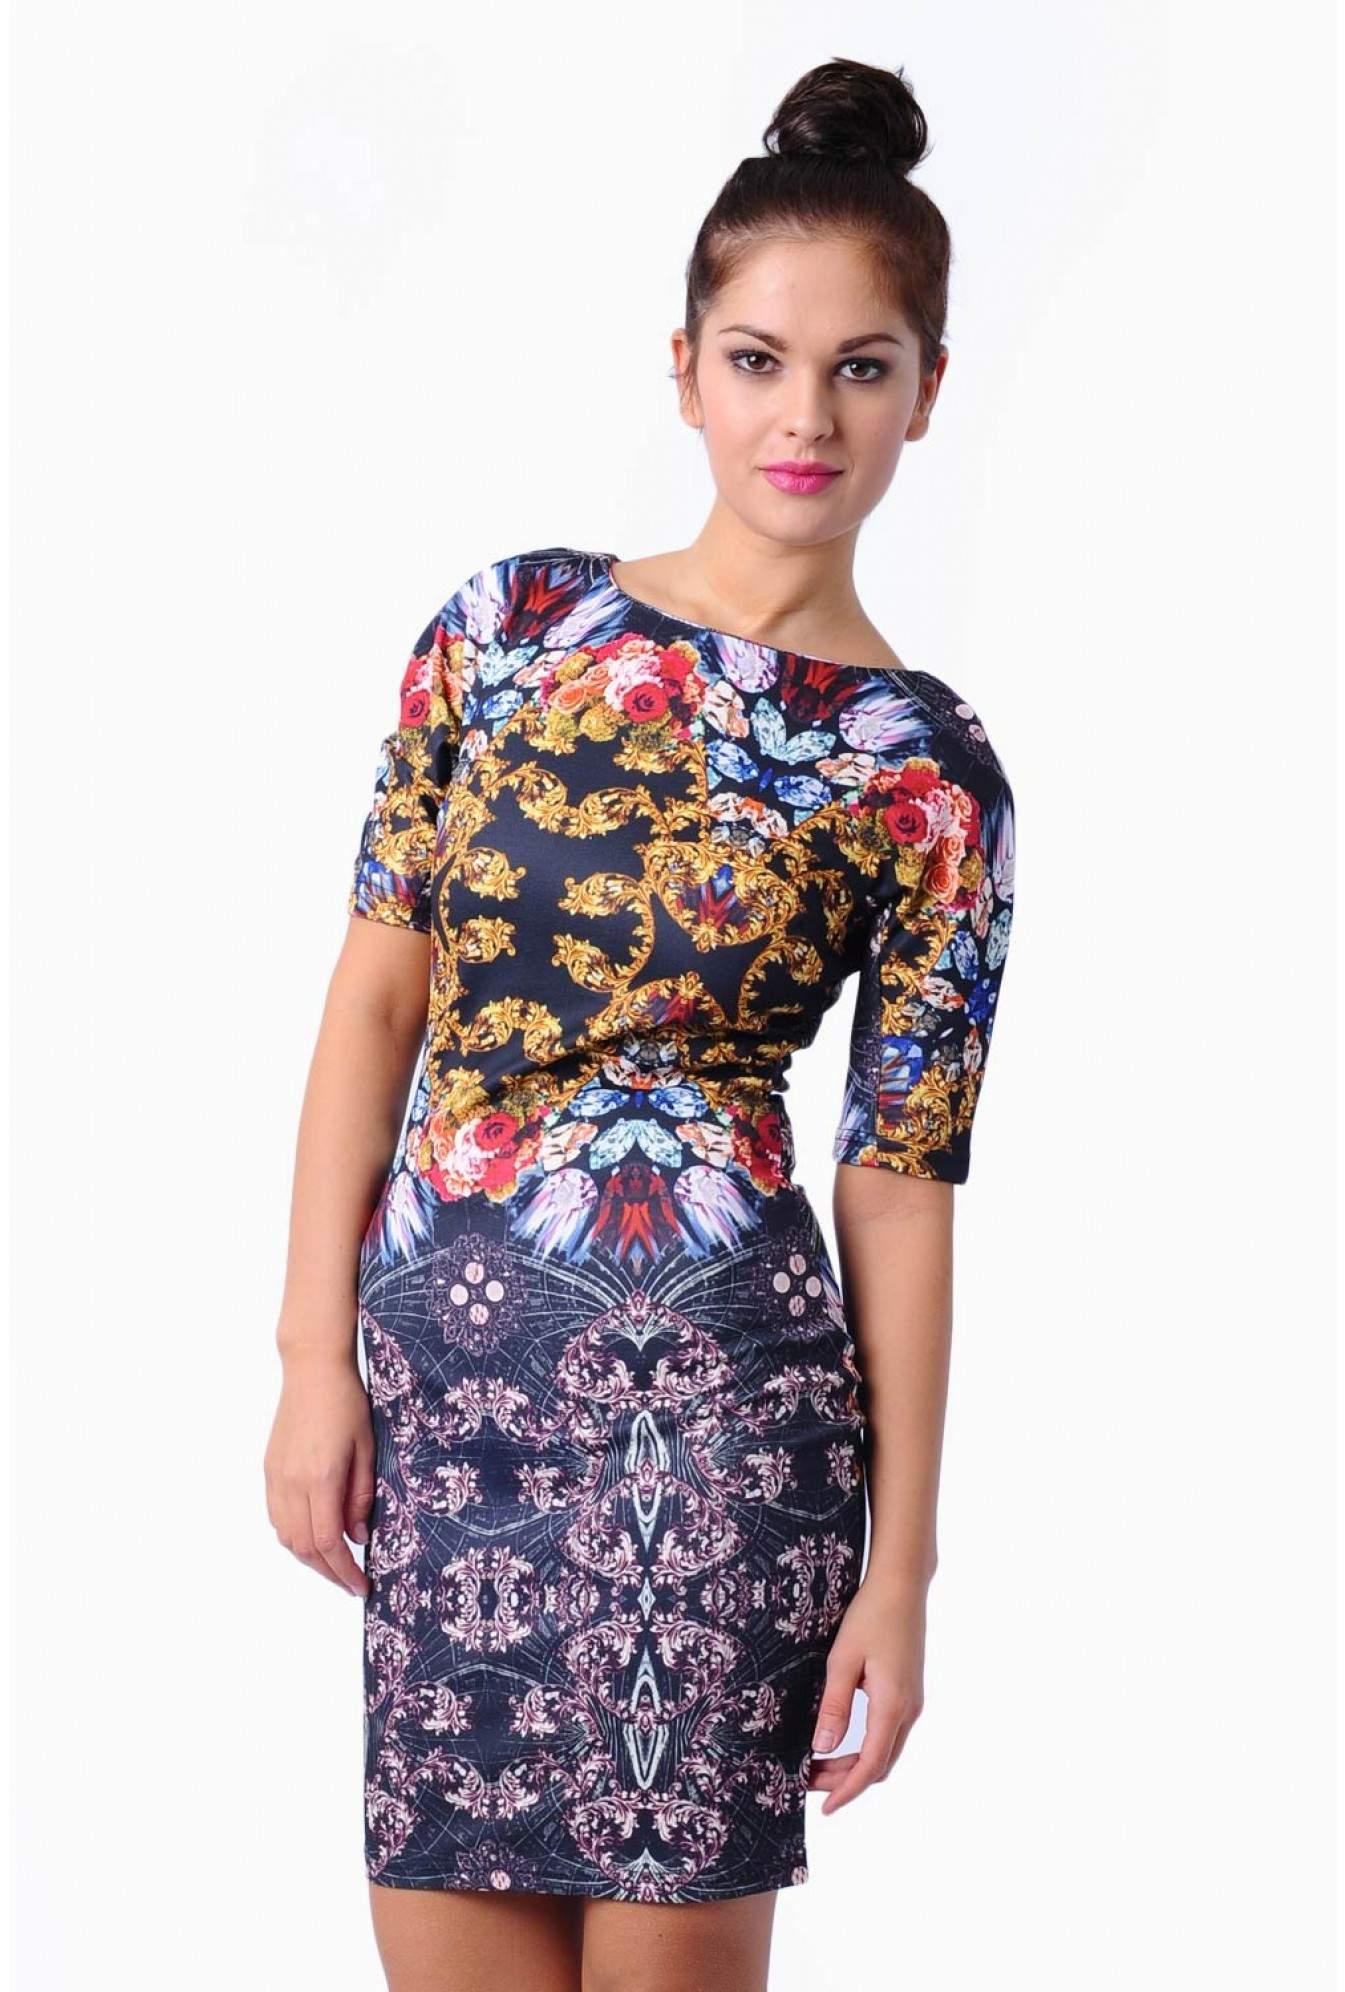 bee479d329d Ax Paris Black Floral Print Bodycon Dress - Gomes Weine AG